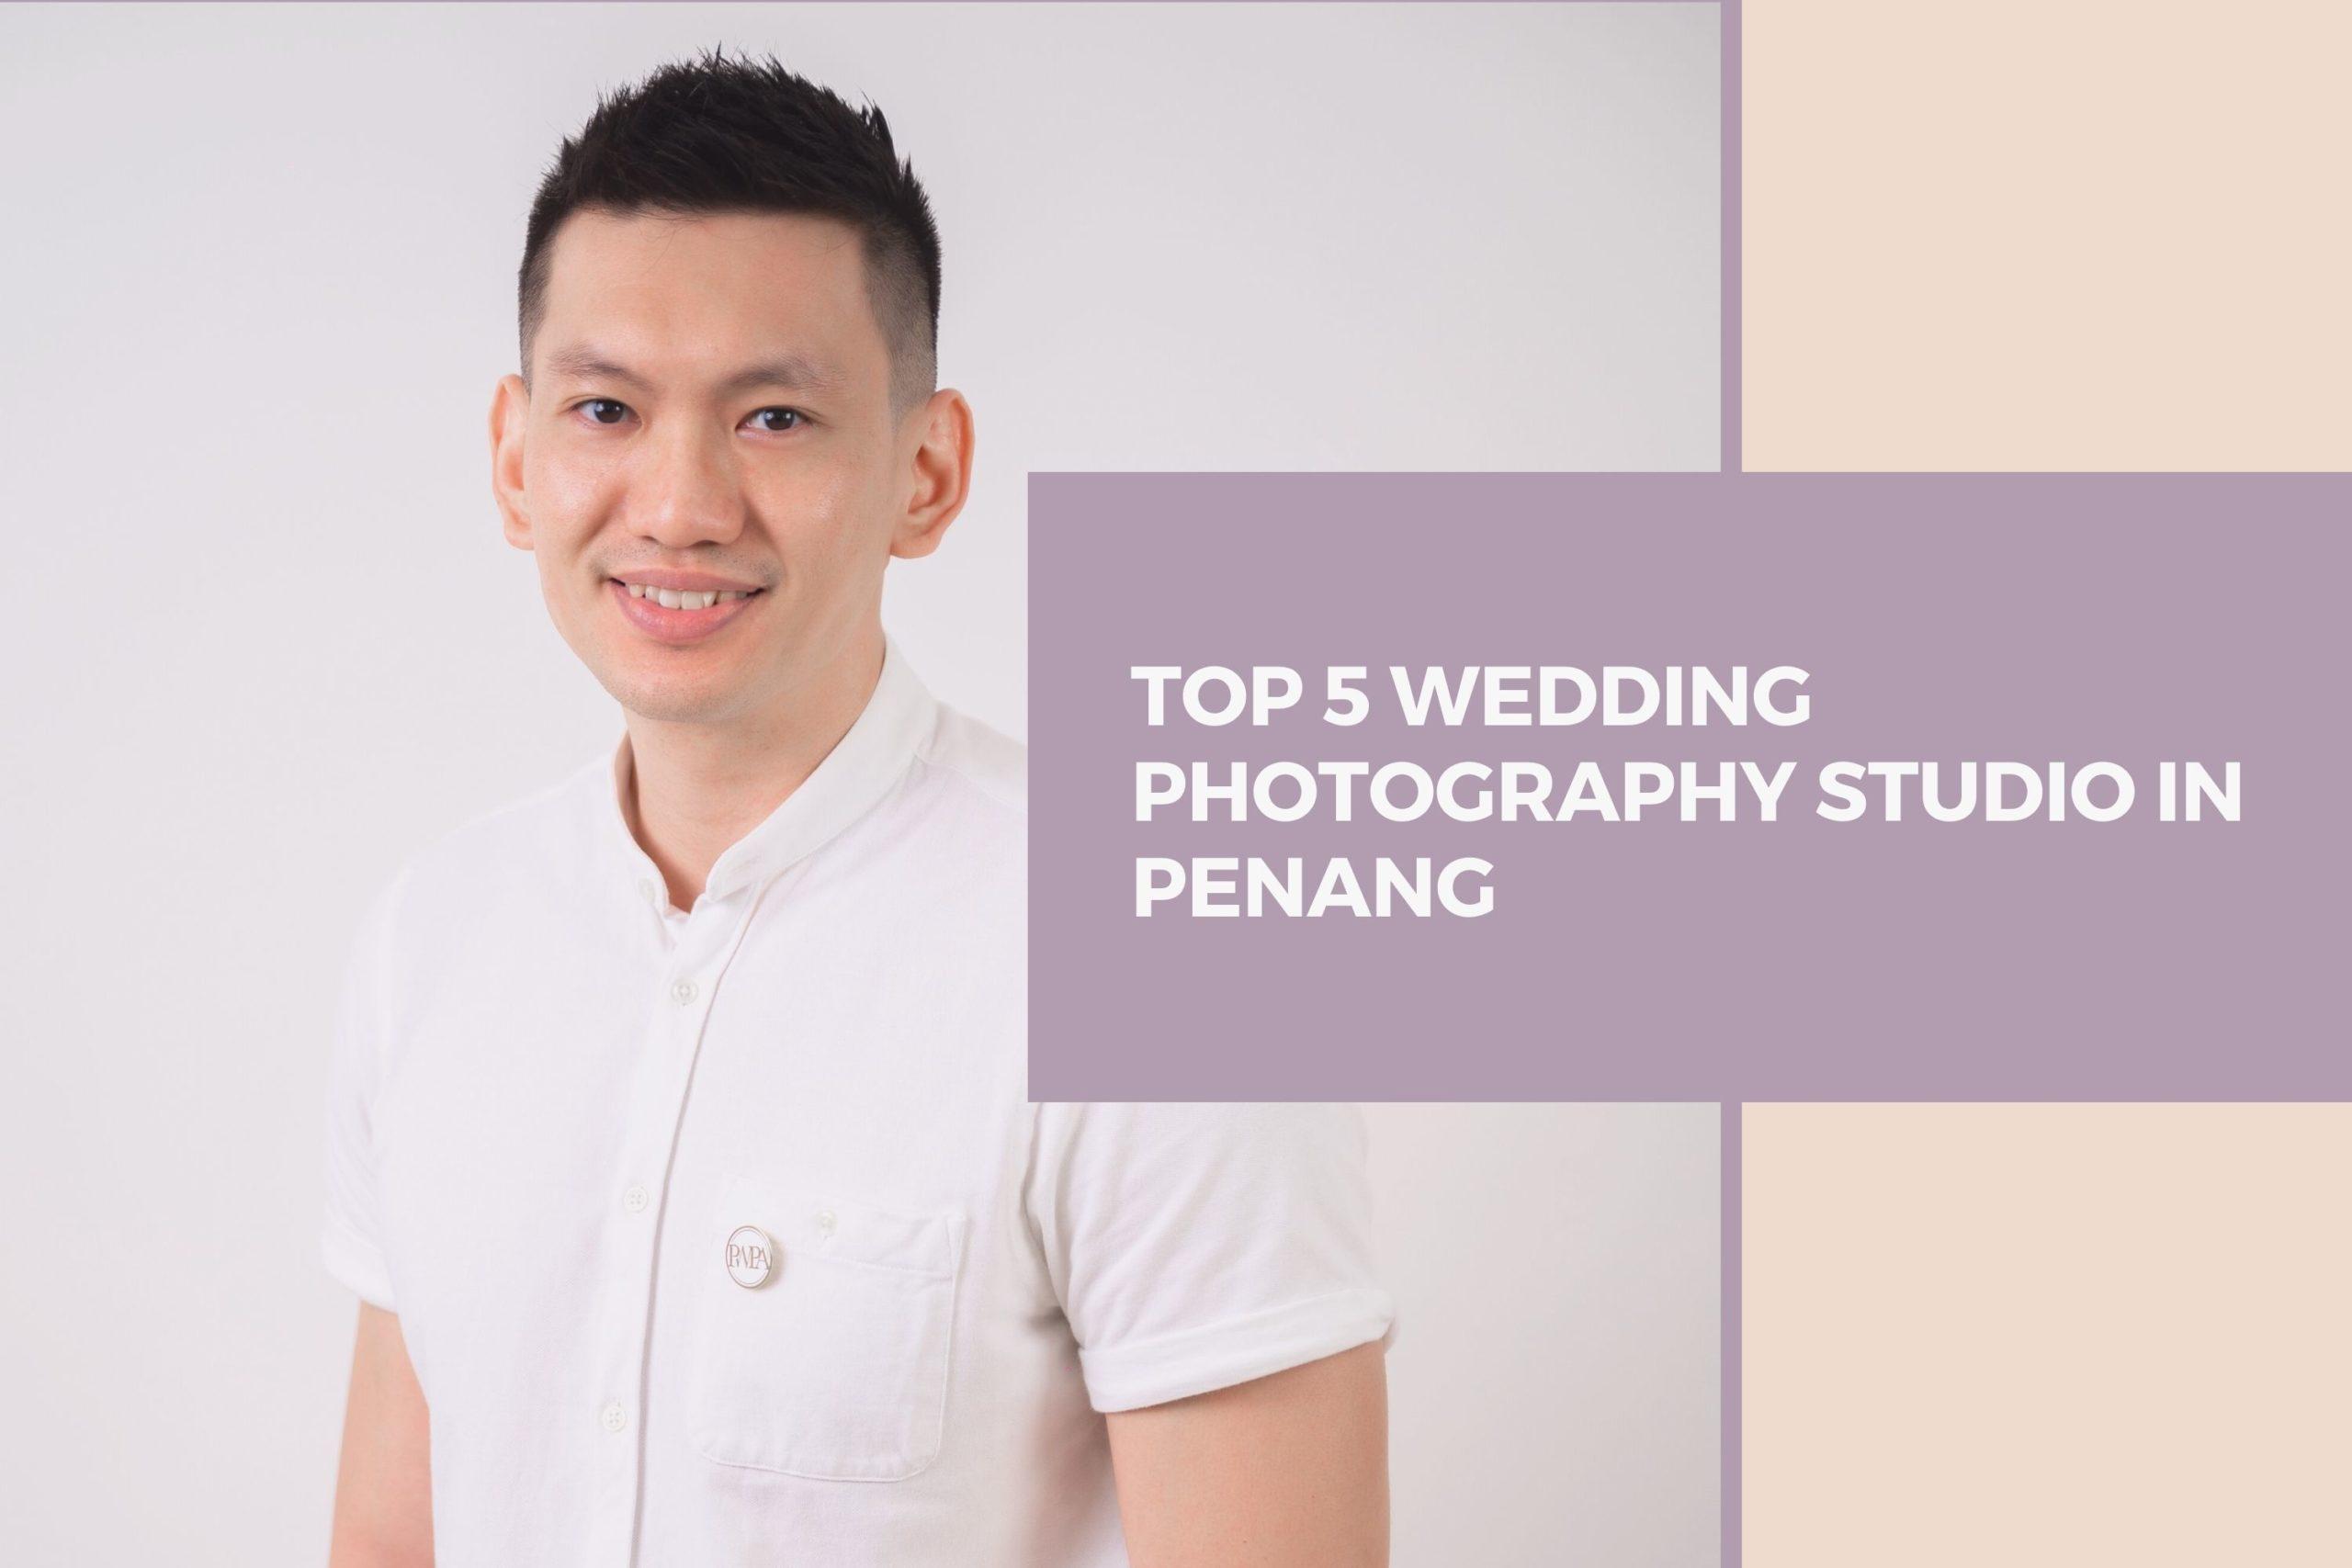 Top 5 Wedding Photography Studio In Penang